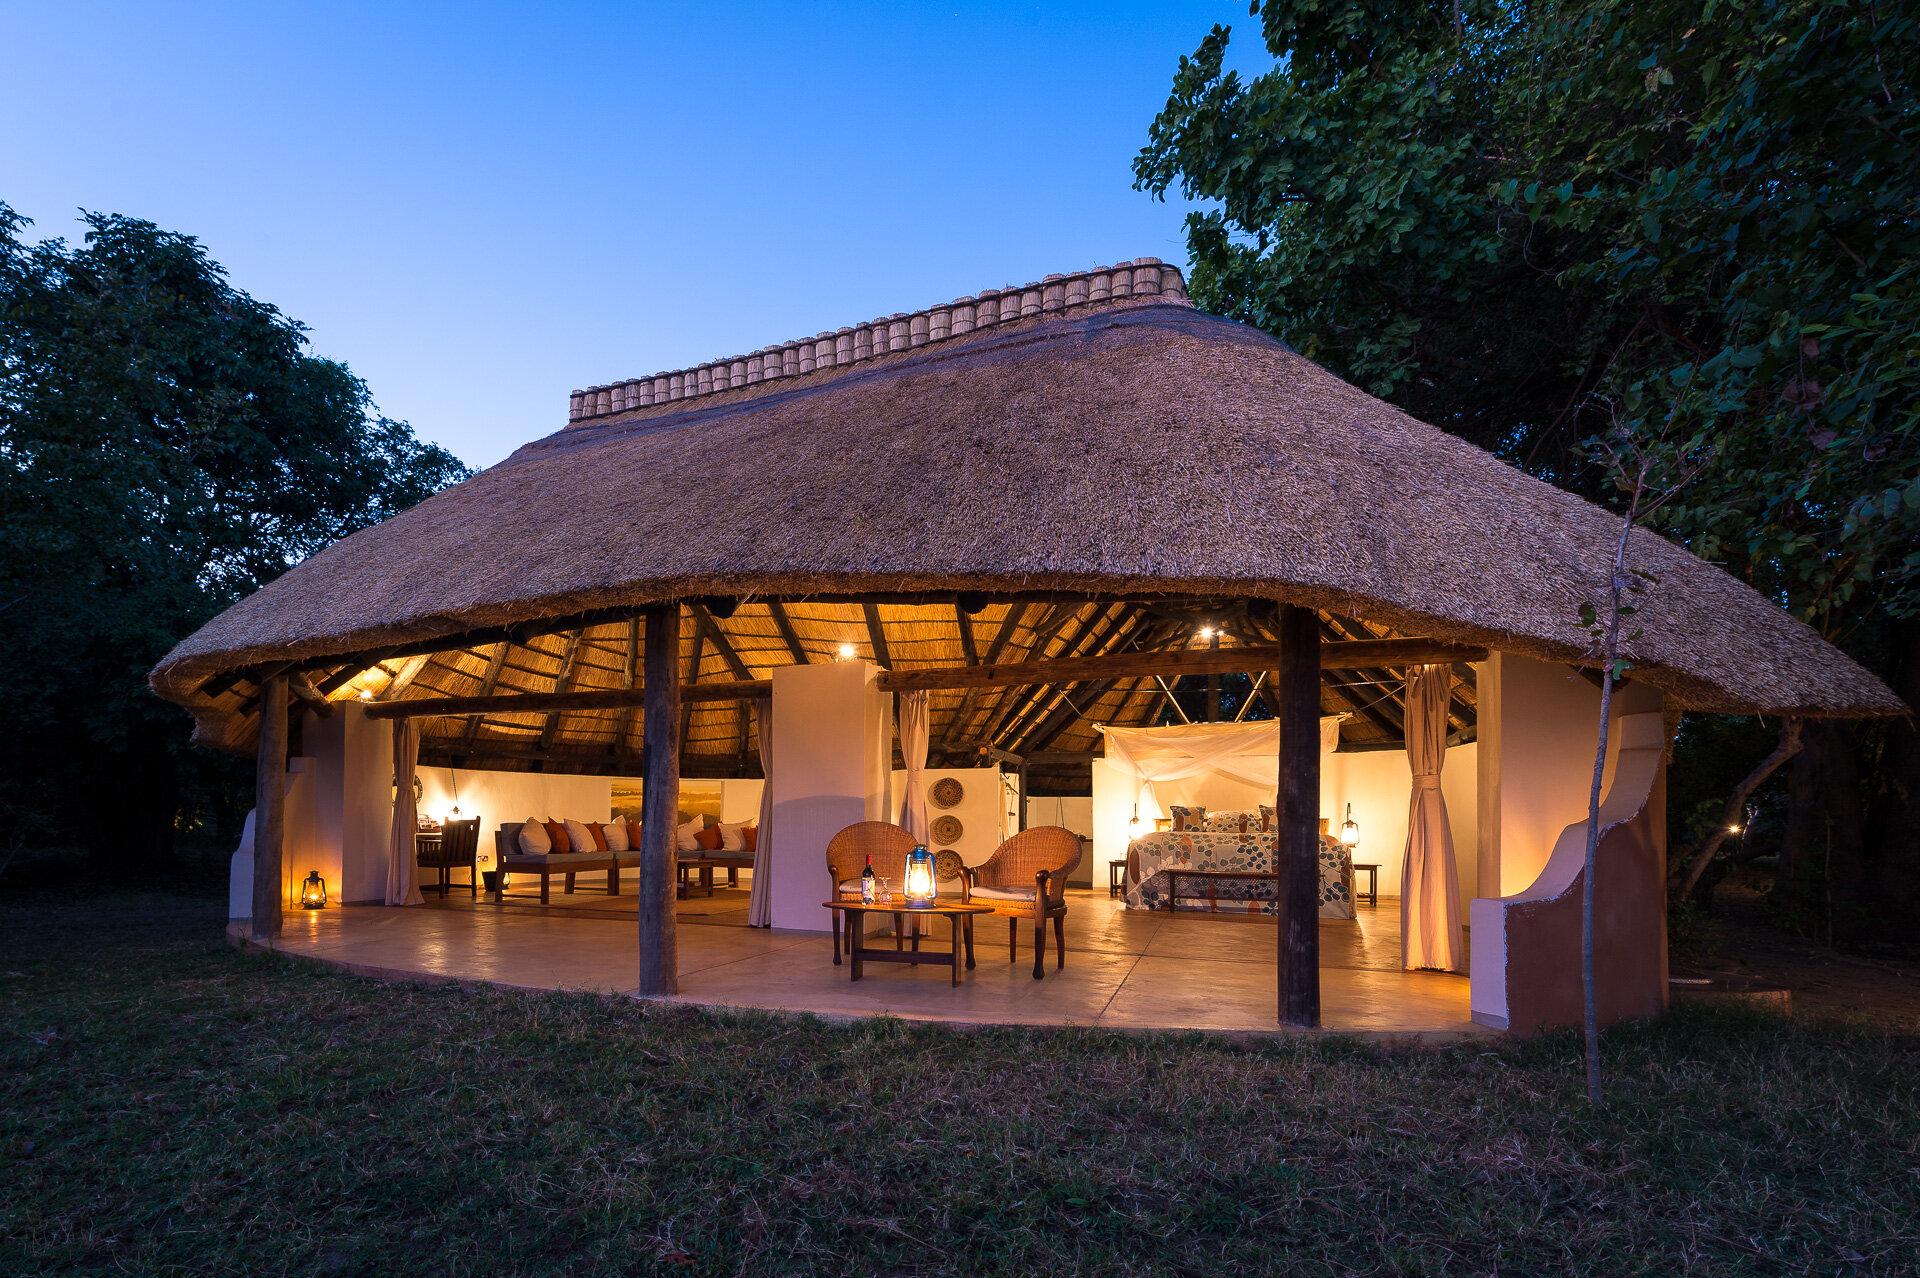 robin pope safaris - nkwali camp